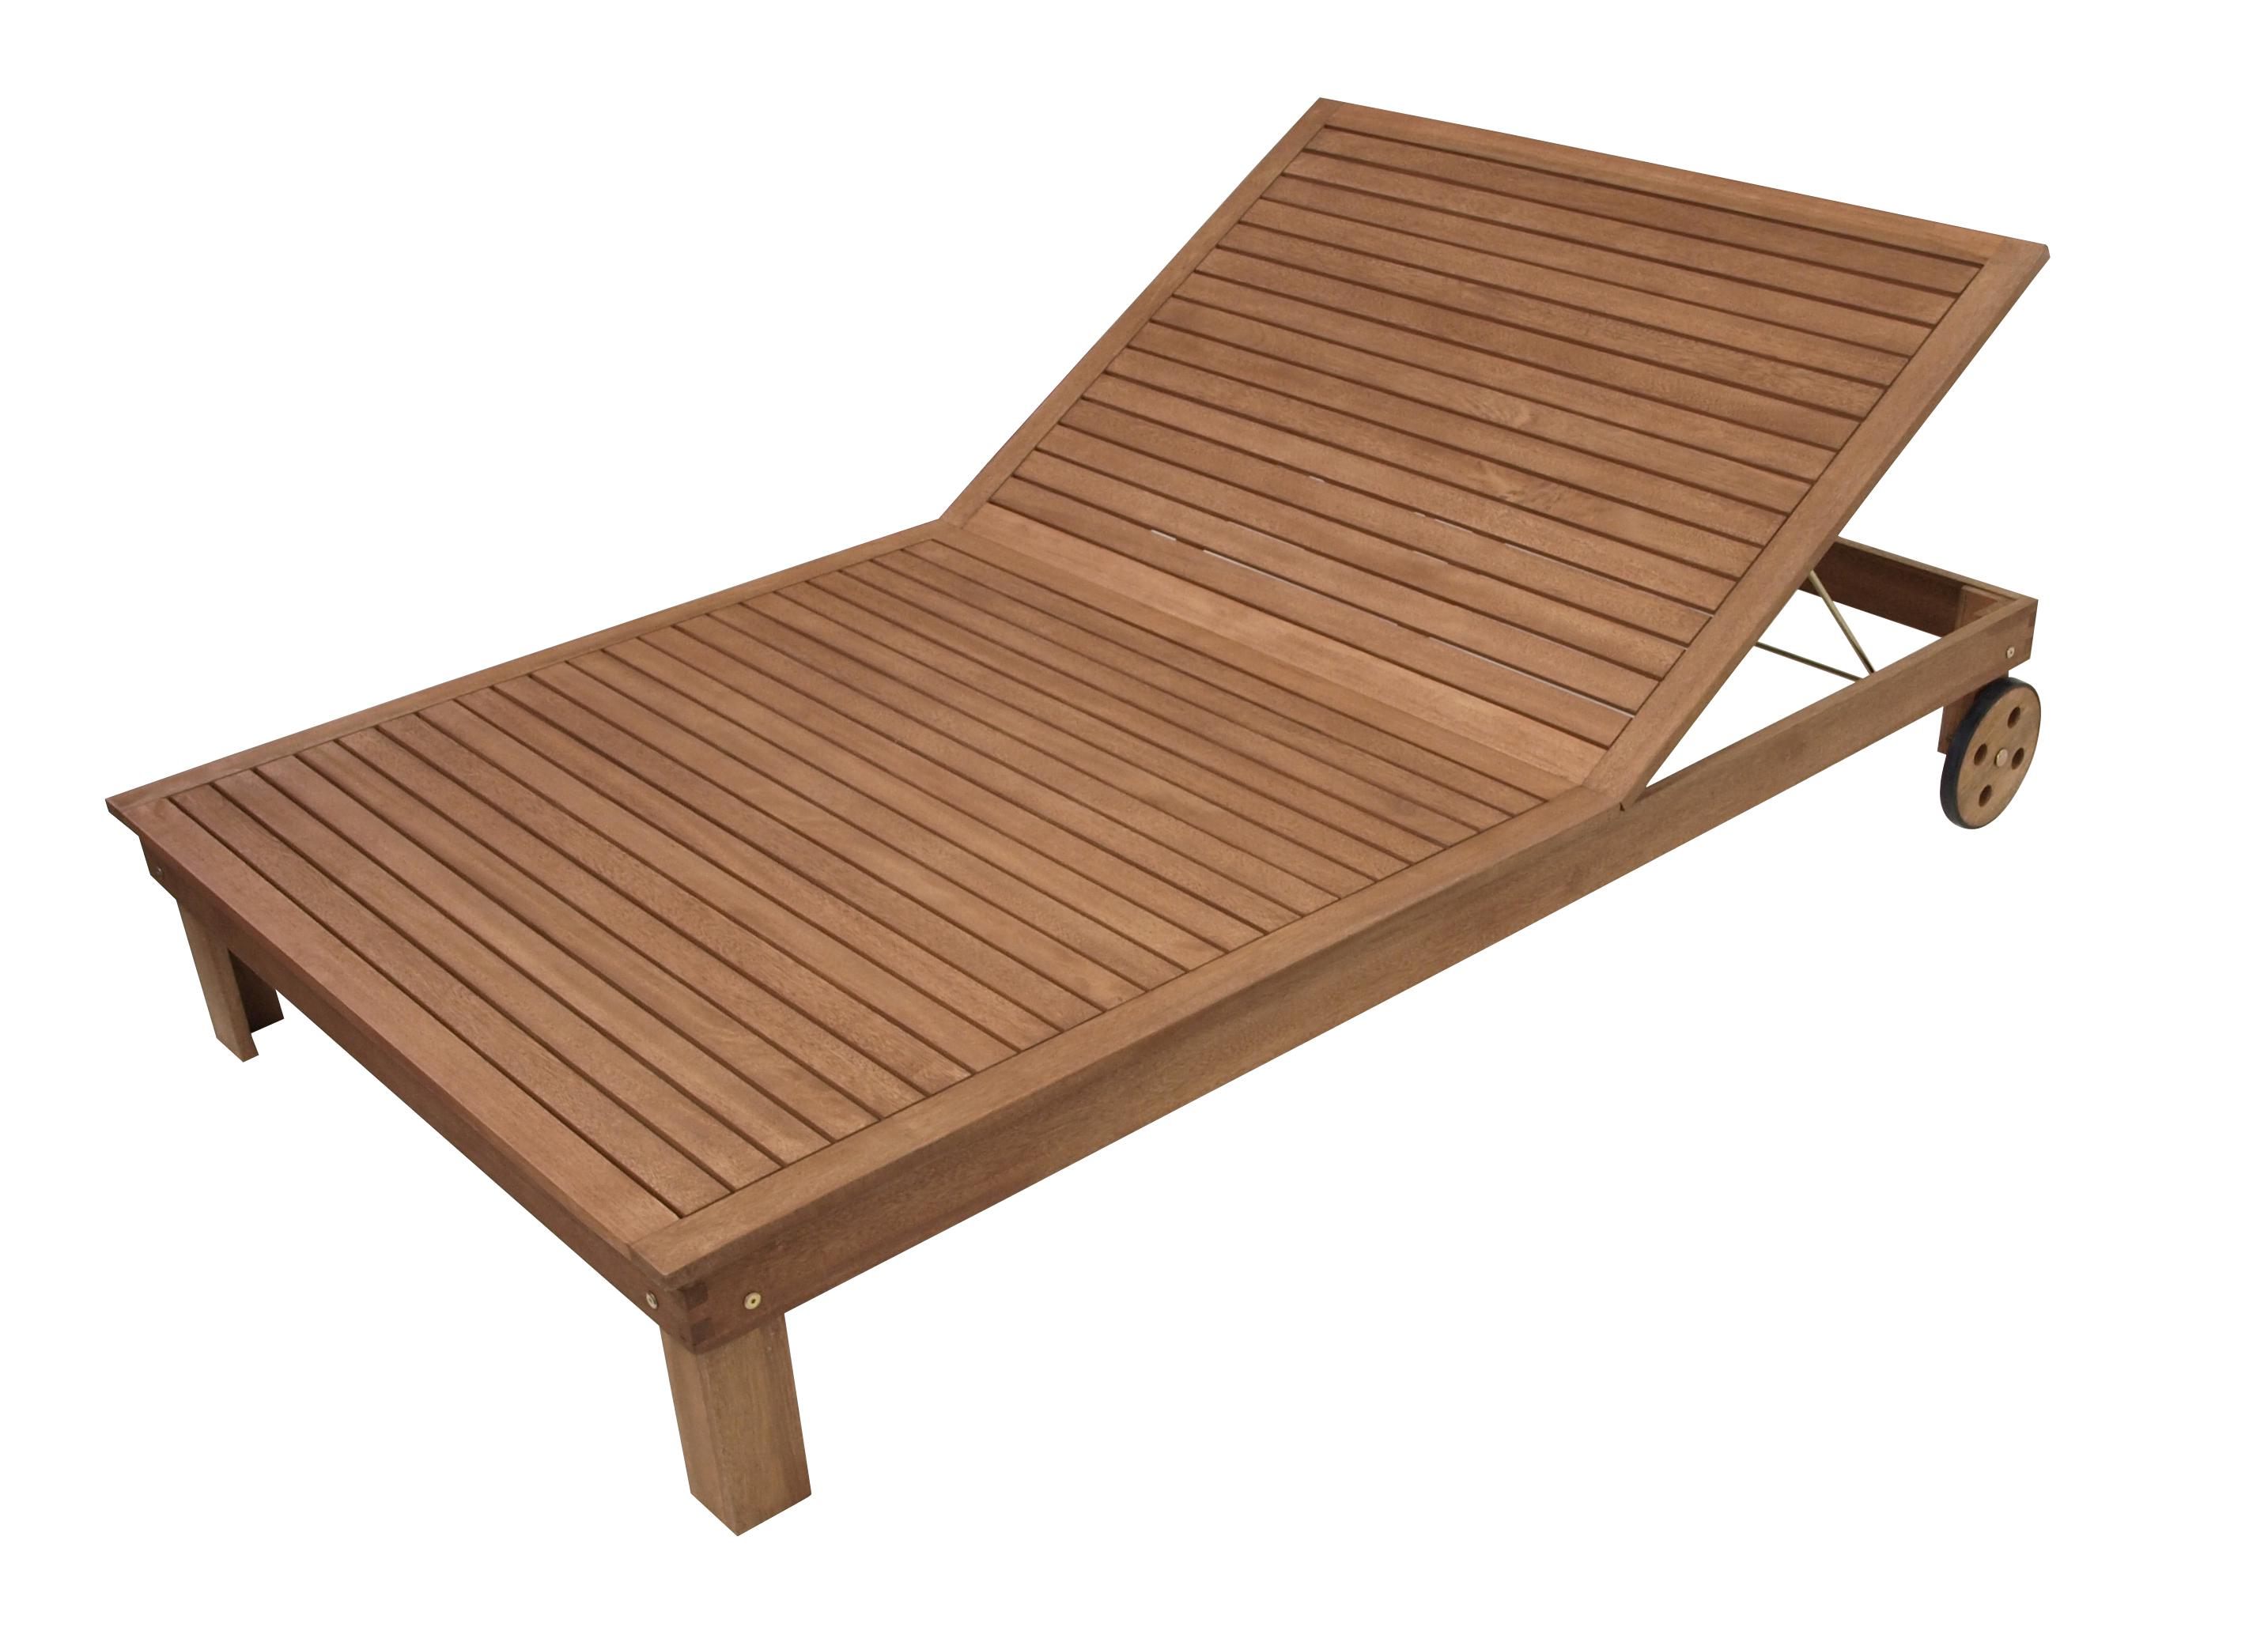 doppelliege rio fsc eukalyptusholz xxl gartenliege sonnenliege garten liege ebay. Black Bedroom Furniture Sets. Home Design Ideas